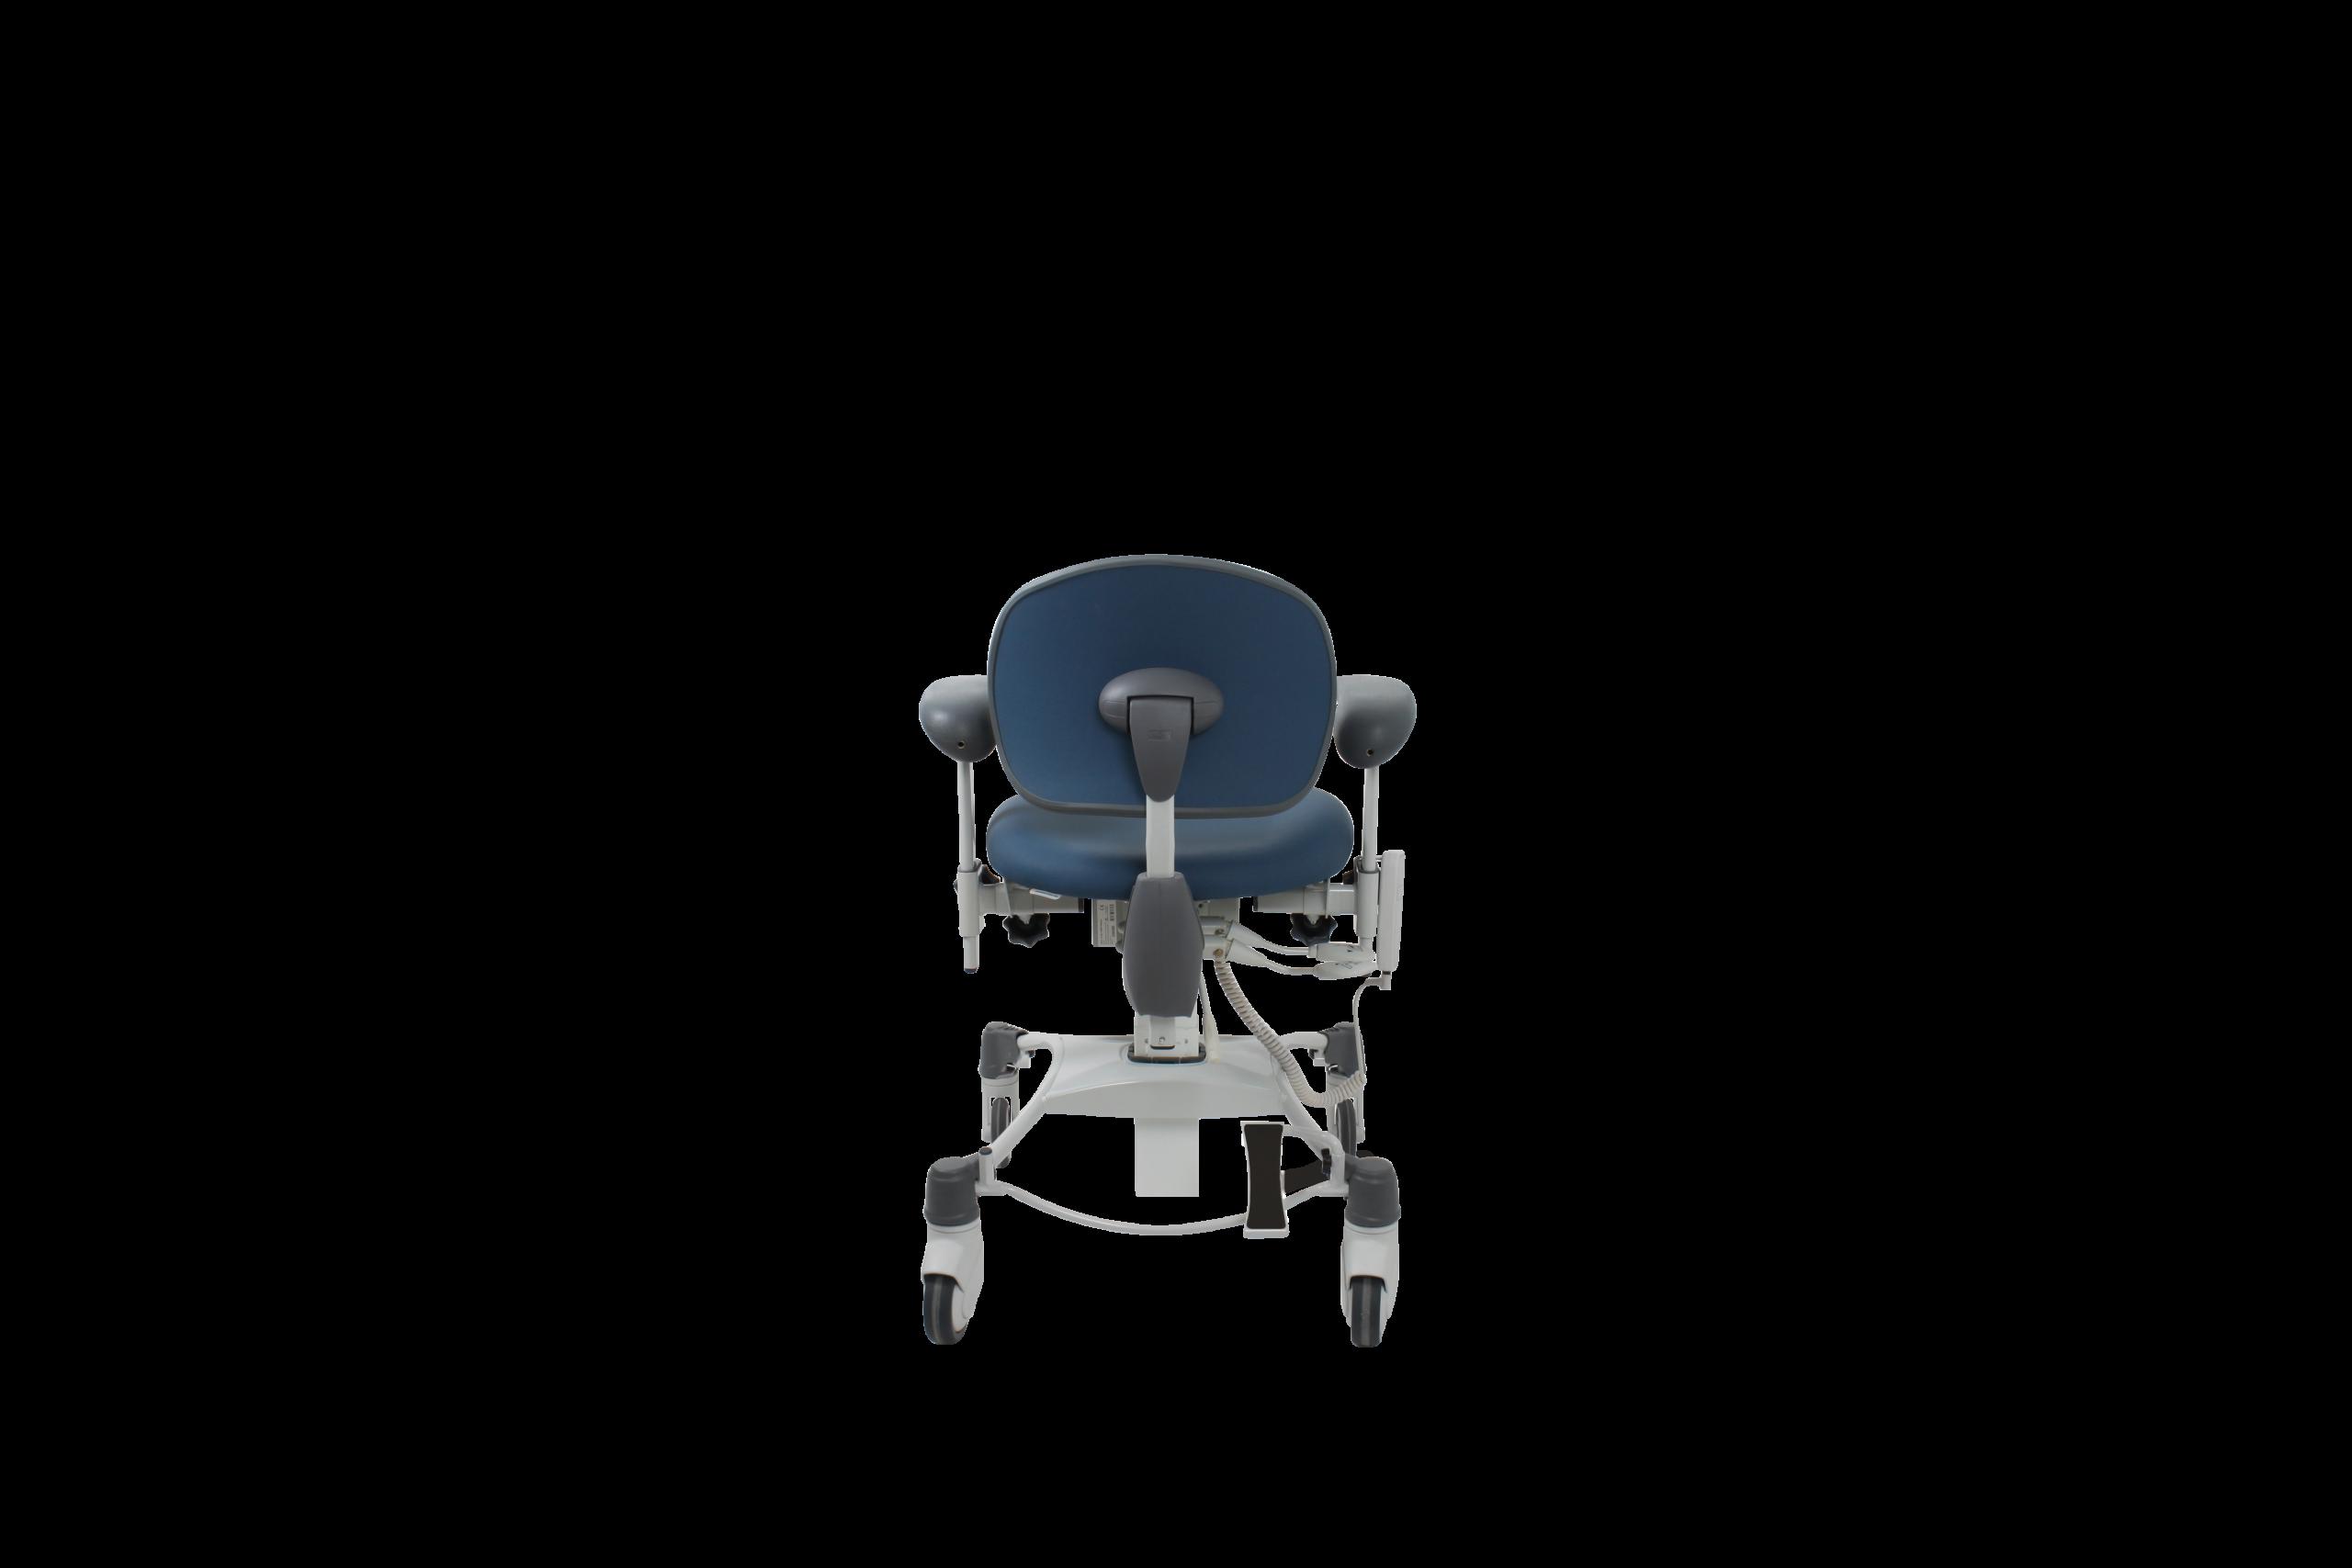 https://www.lameris-group.nl/wp-content/uploads/2020/03/VELA-Basic-Ophtalmology-chair-back-edit-scaled.png